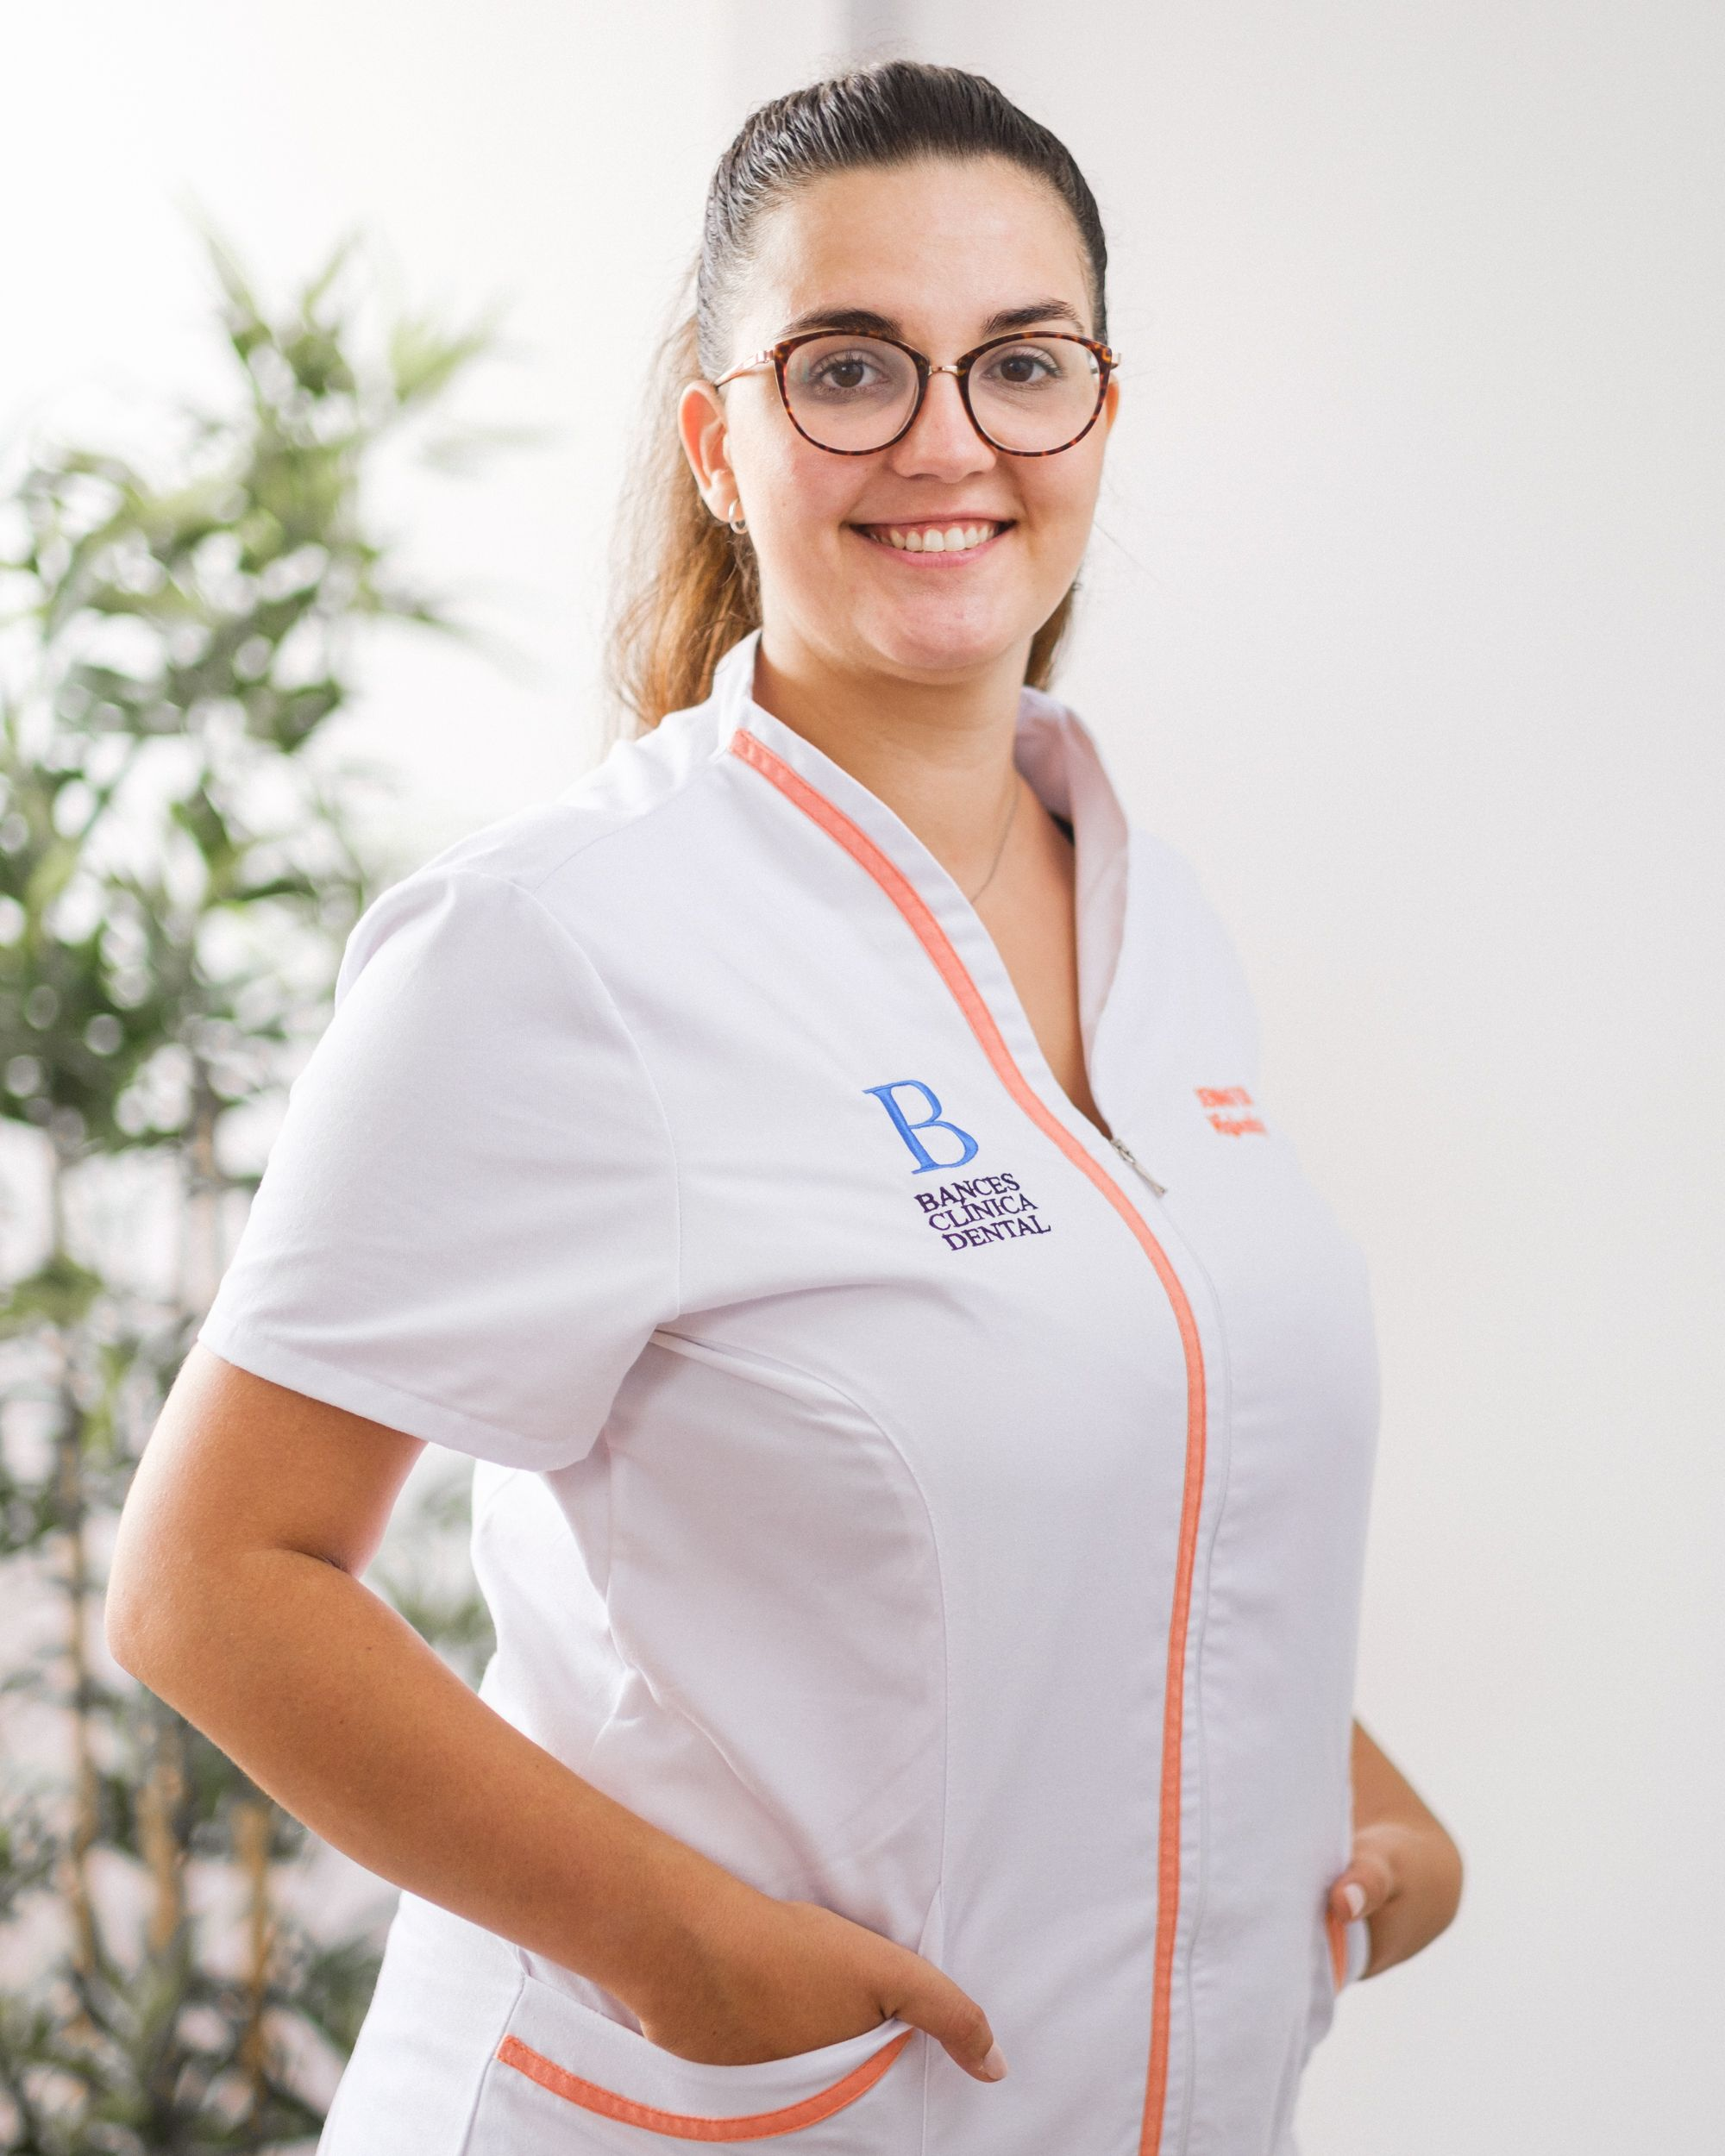 Jennifer Gonzalez Delgado